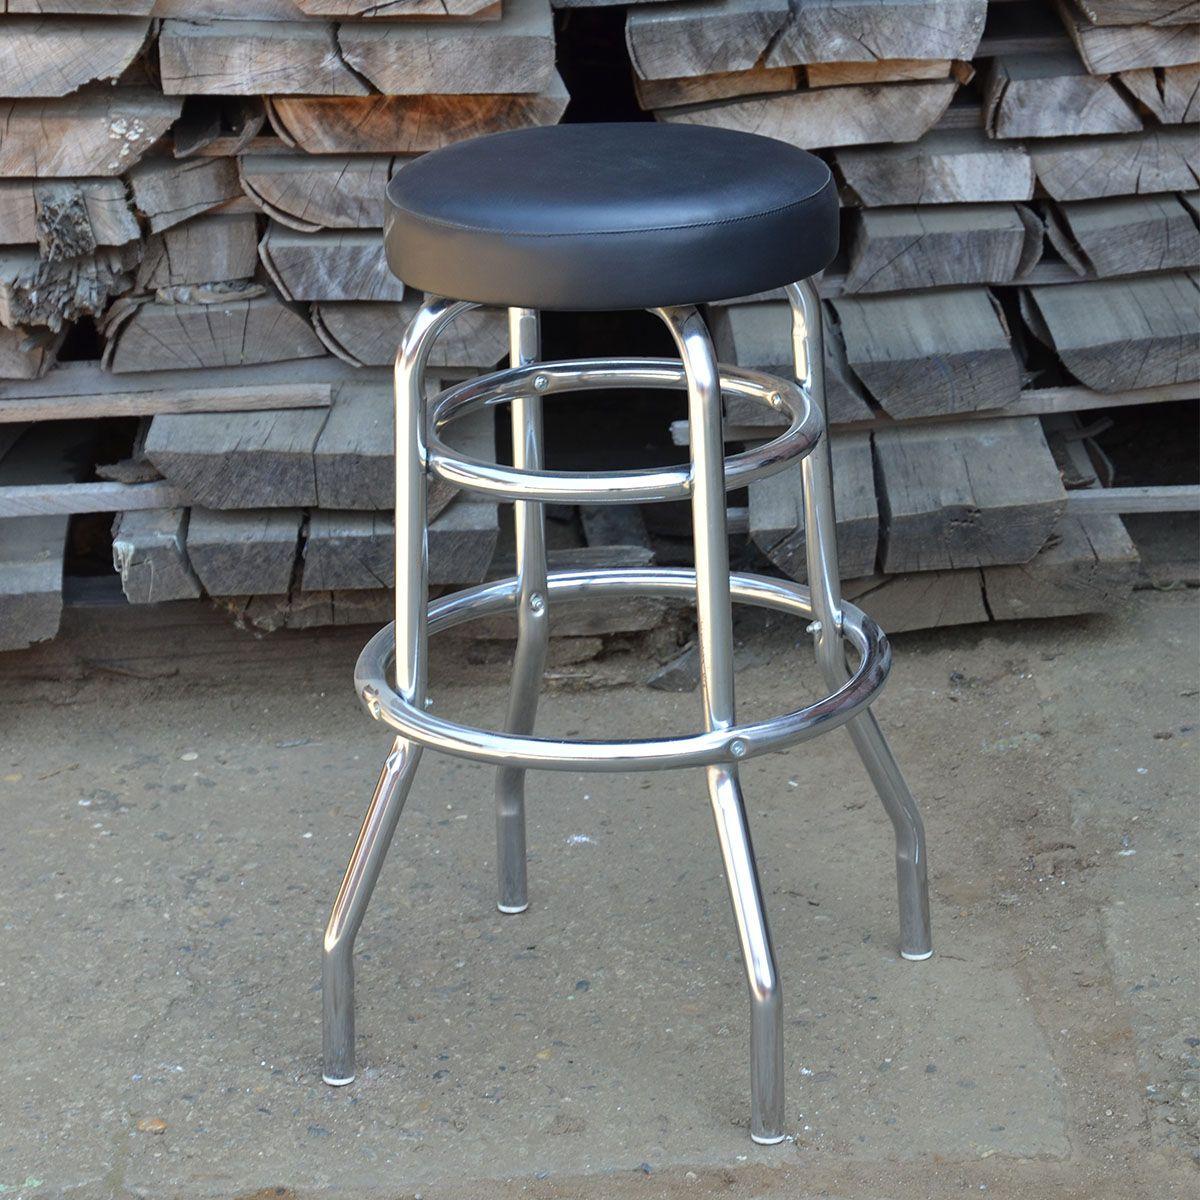 50s diner bar stool